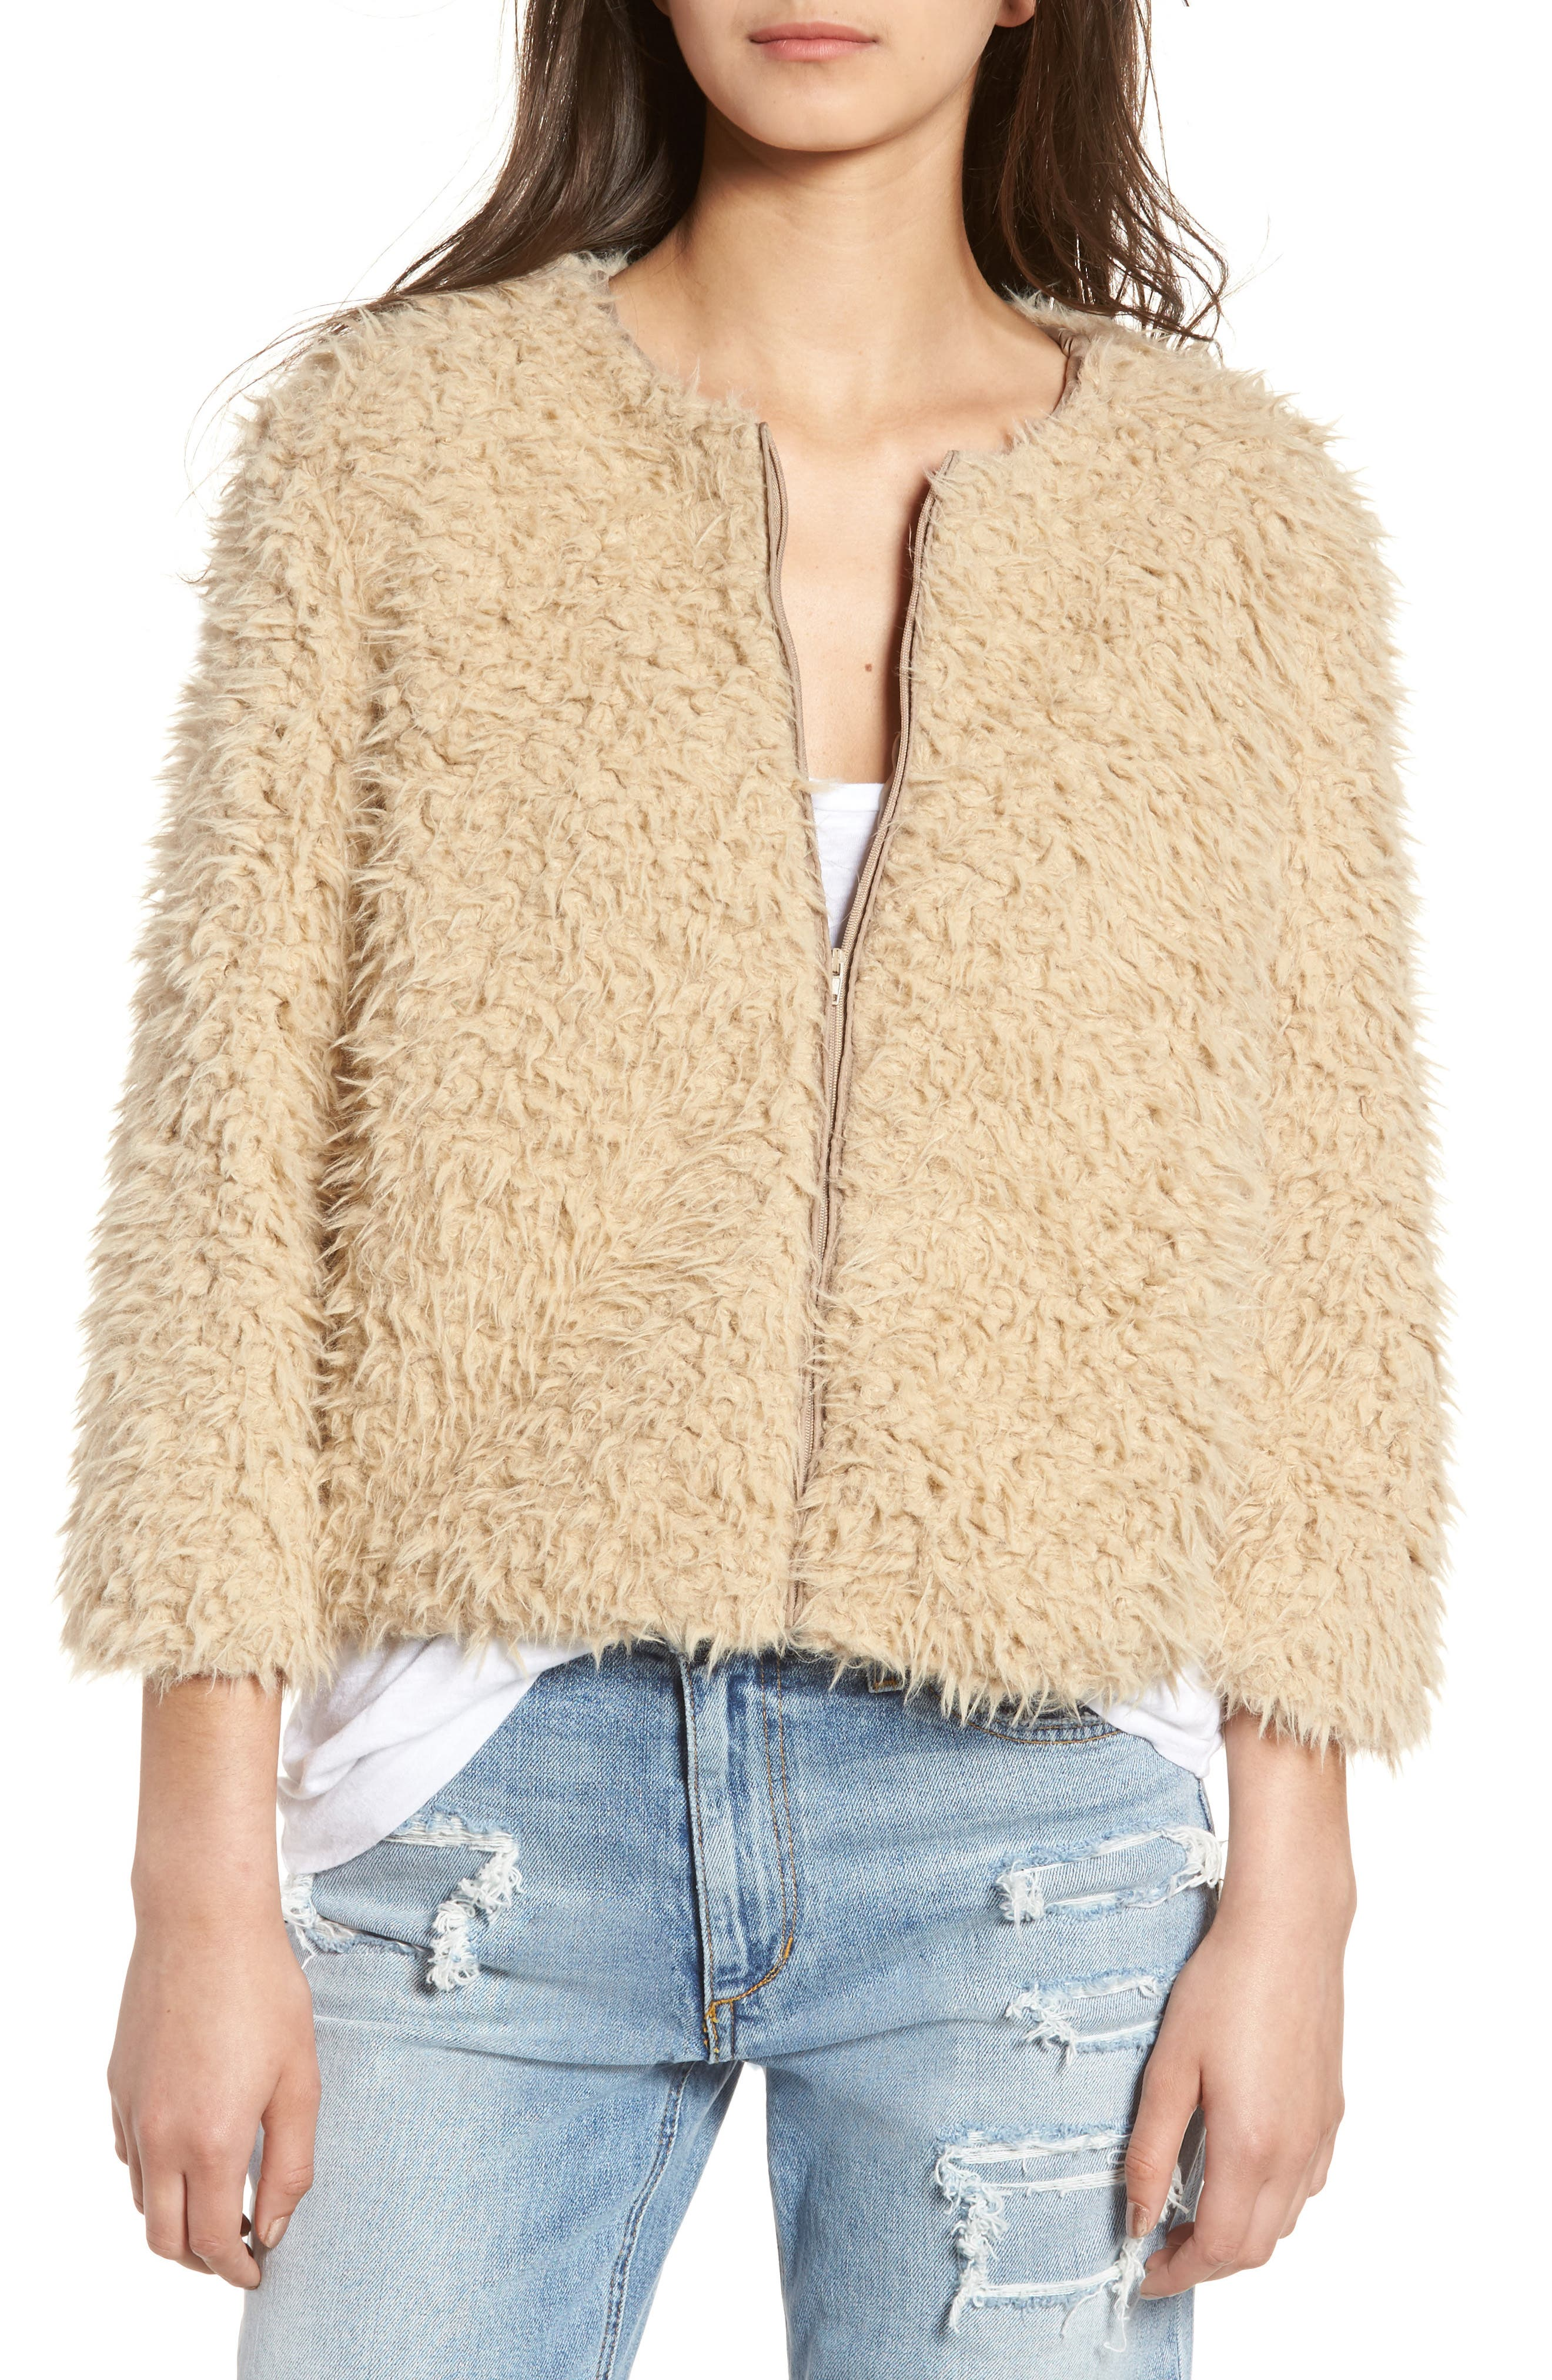 Macy Faux Fur Jacket,                             Alternate thumbnail 4, color,                             Light Camel